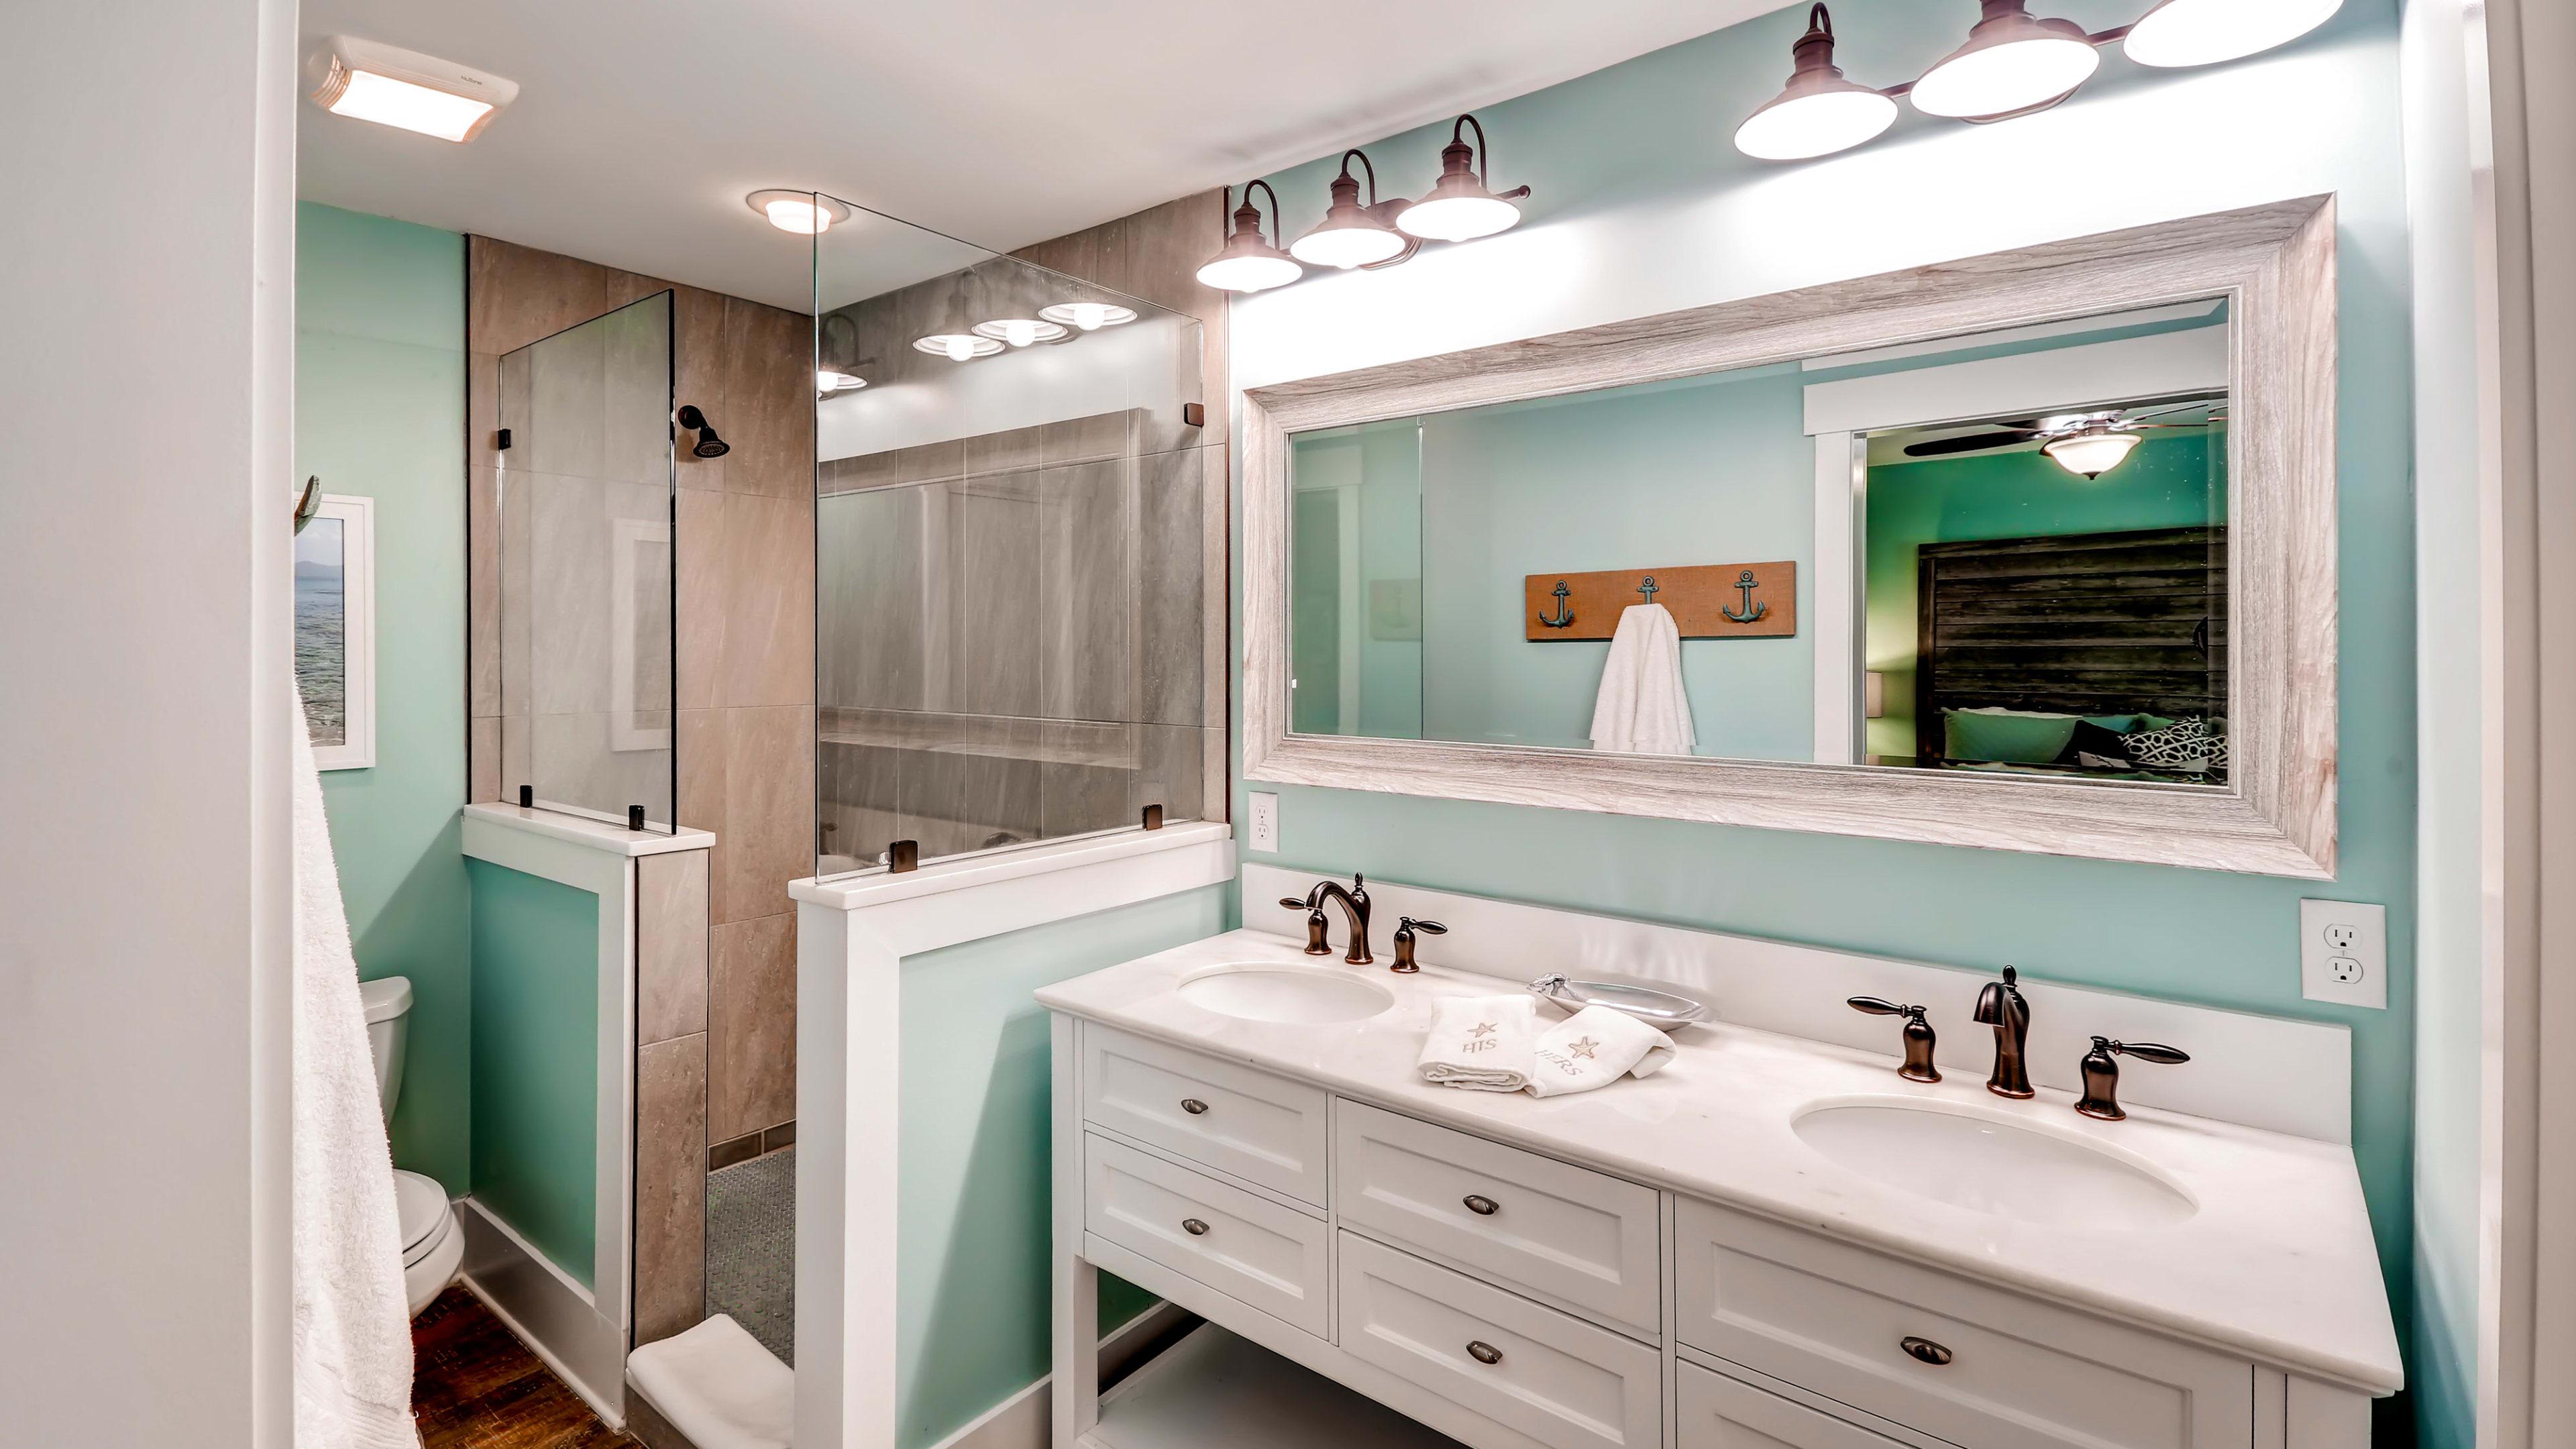 Full Bathroom | Dual Sinks | Walk-In Shower | Towels Provided